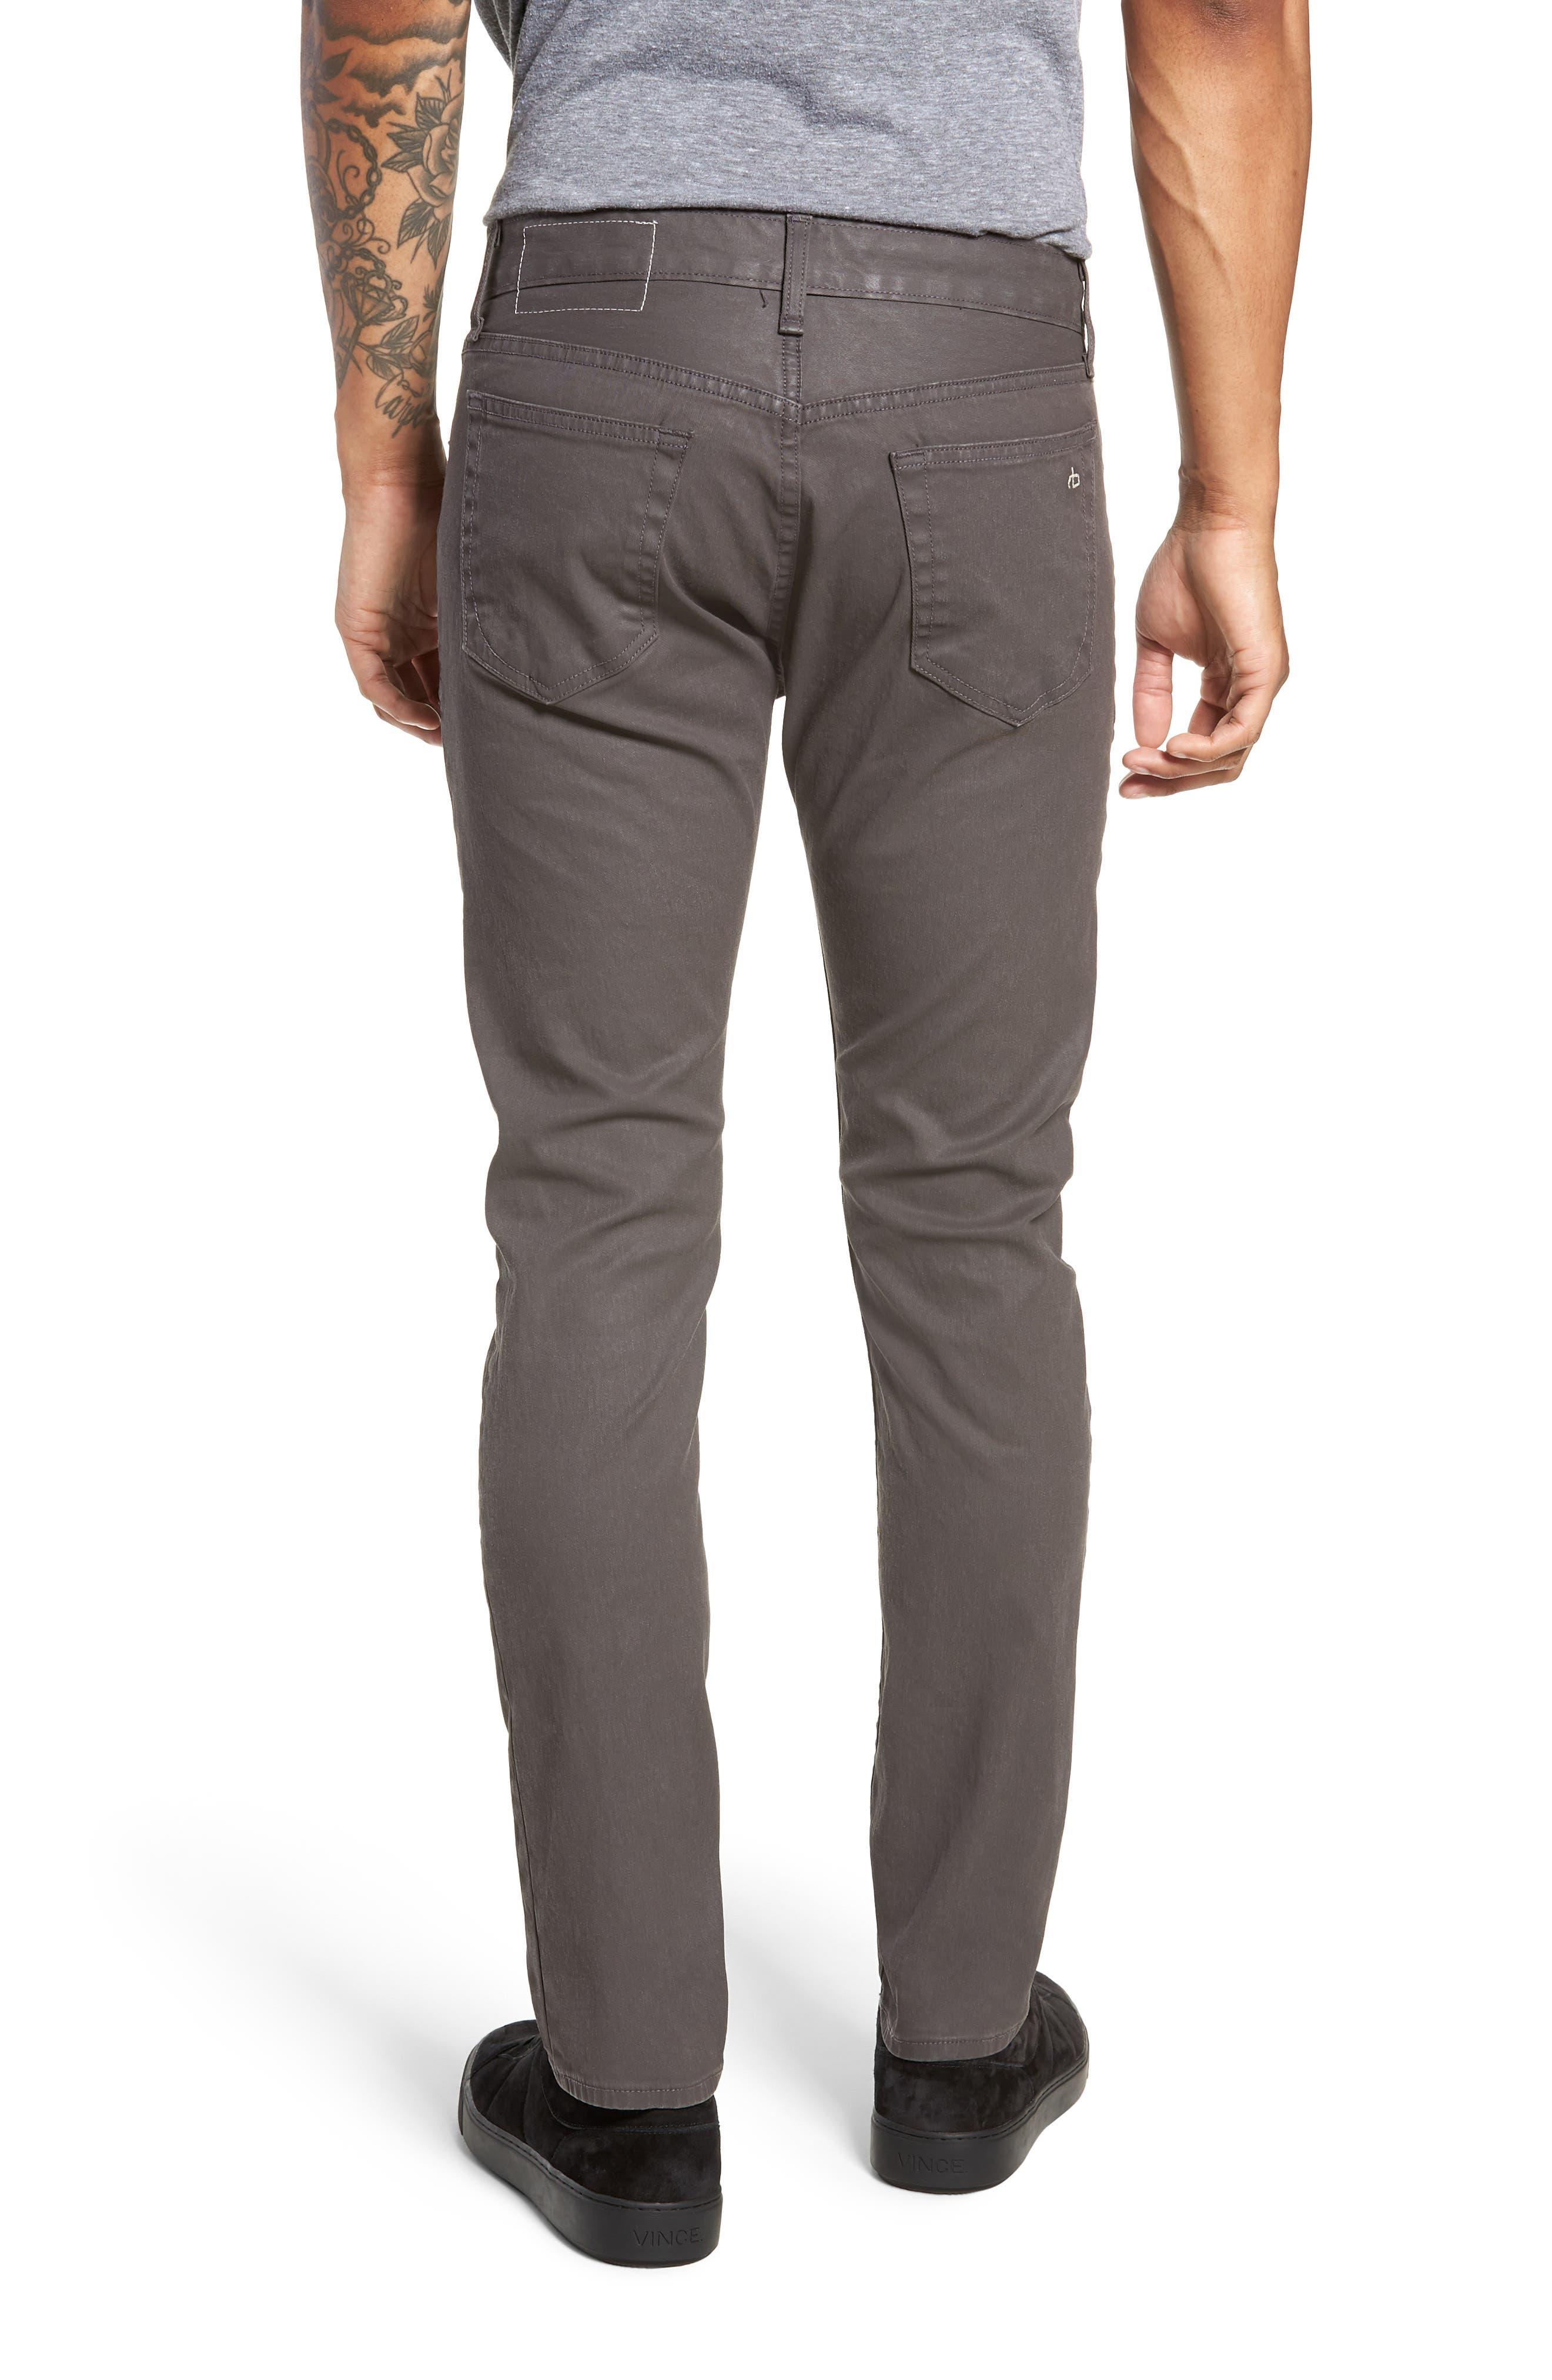 RAG & BONE, Fit 2 Slim Fit Pants, Alternate thumbnail 2, color, 020